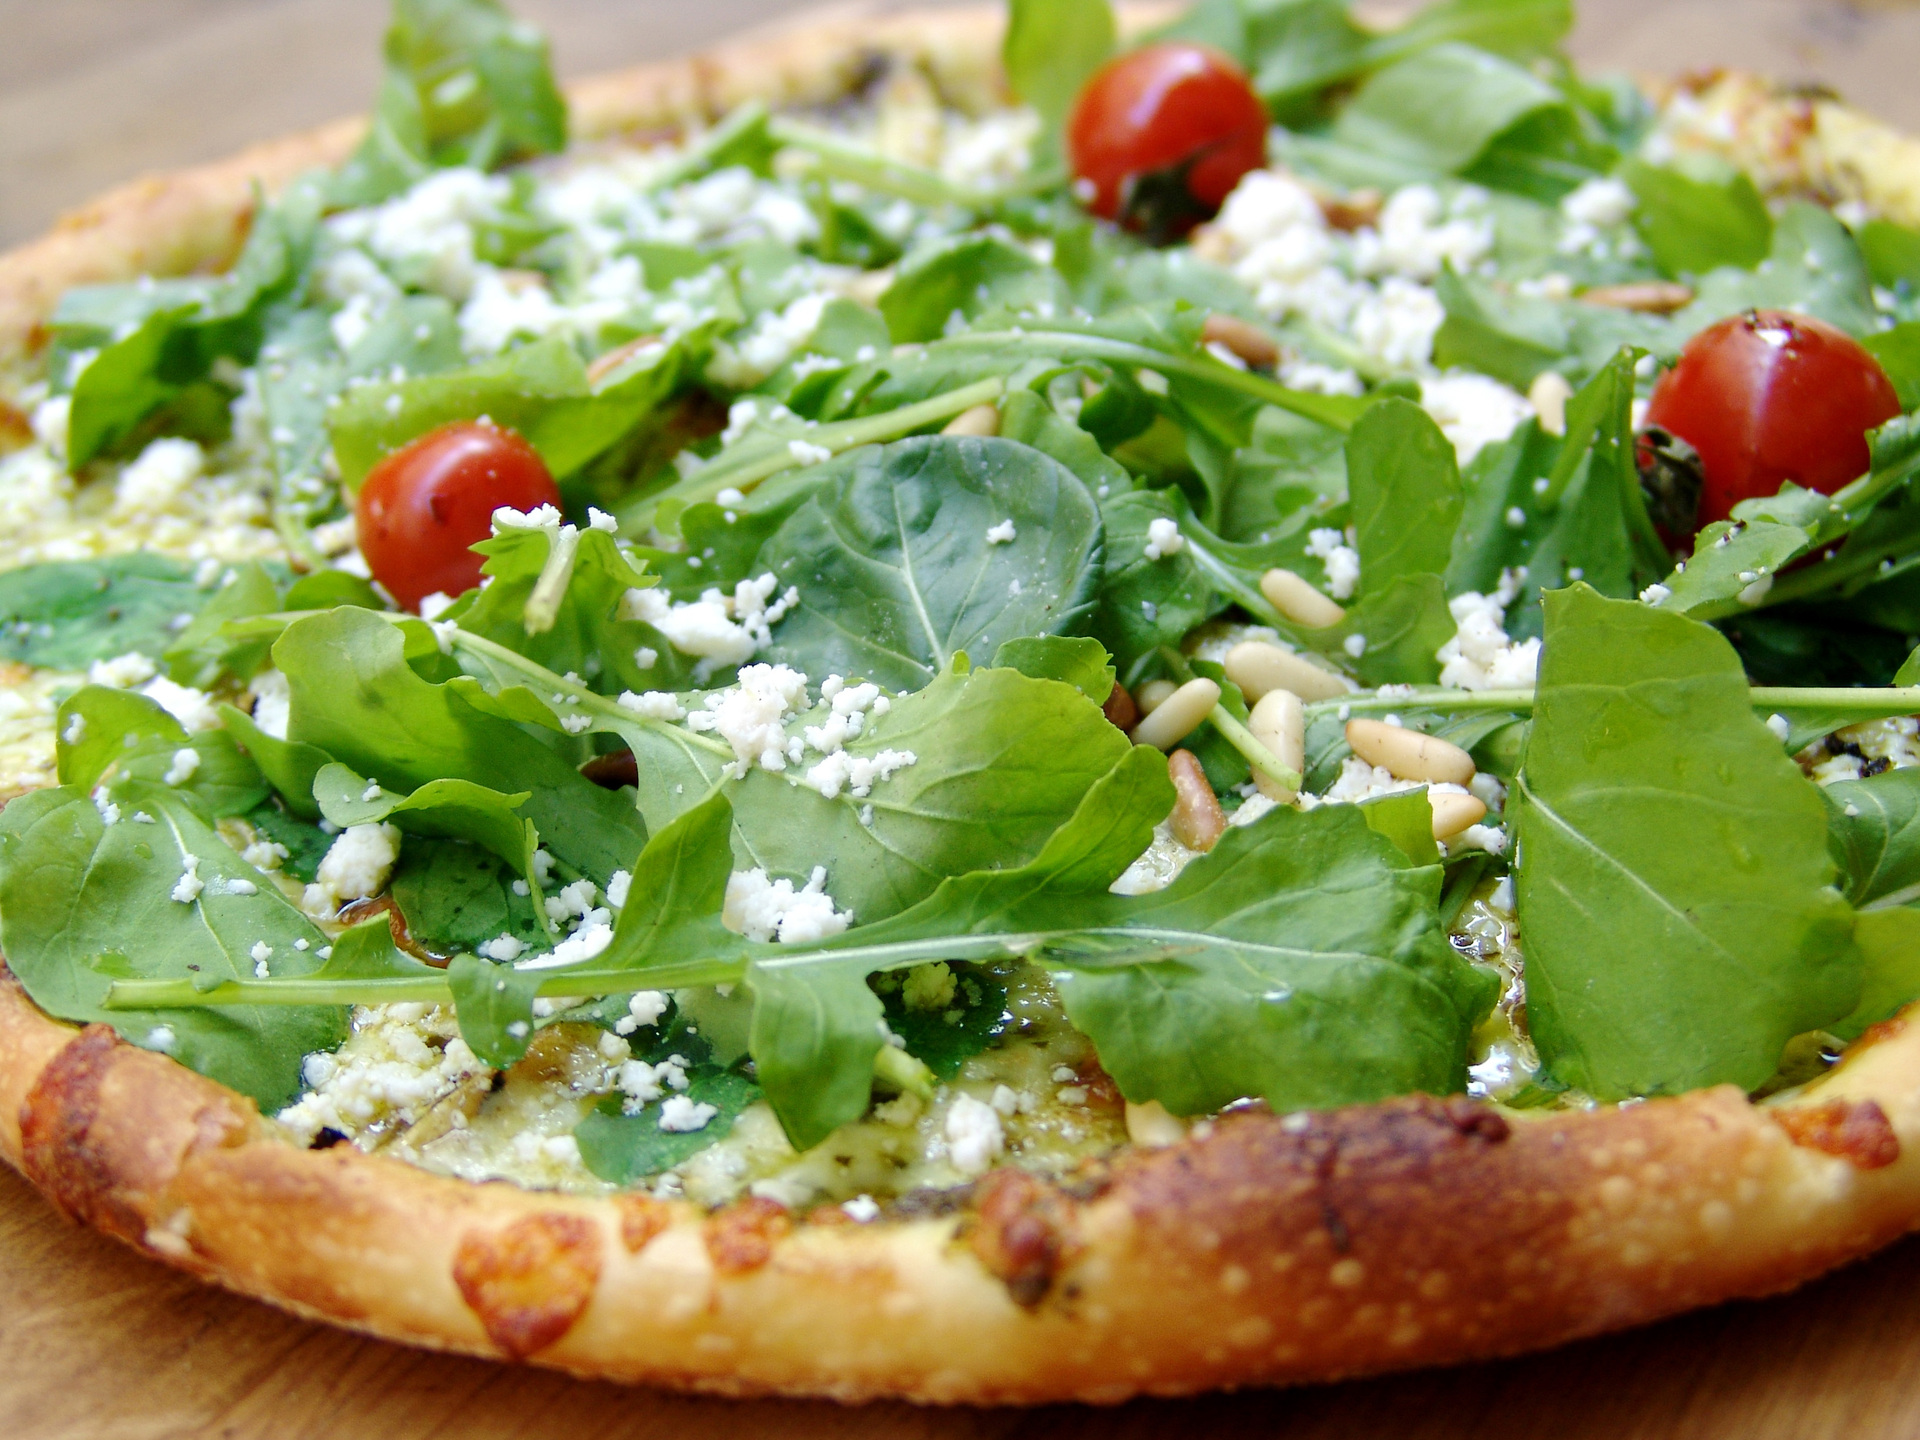 pizza-1-1326545-1920x1440